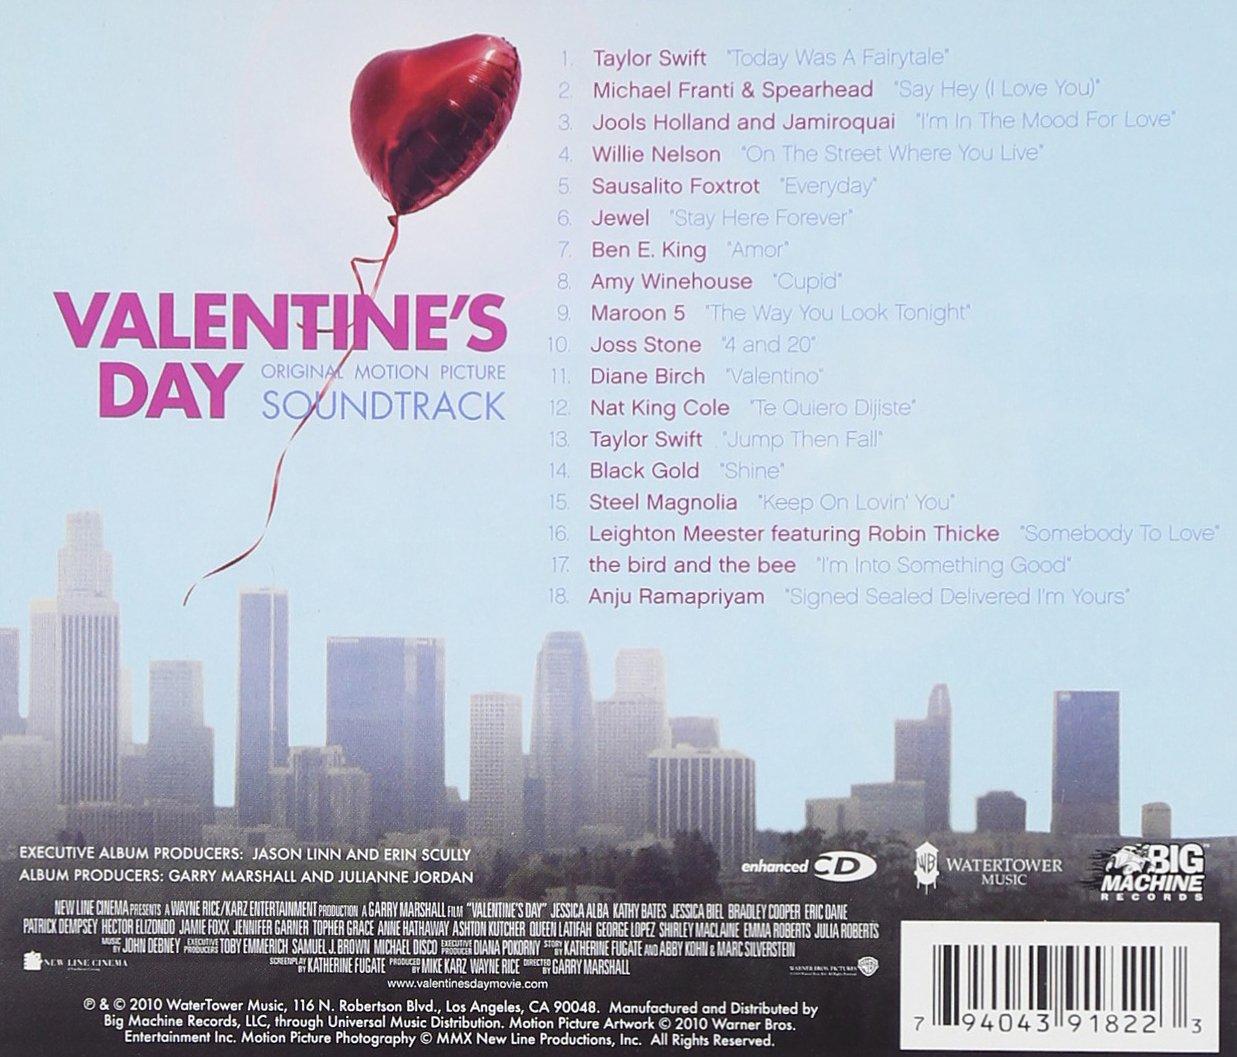 Various Artists   Valentineu0027s Day: Original Motion Picture Soundtrack  [Enhanced CD]   Amazon.com Music